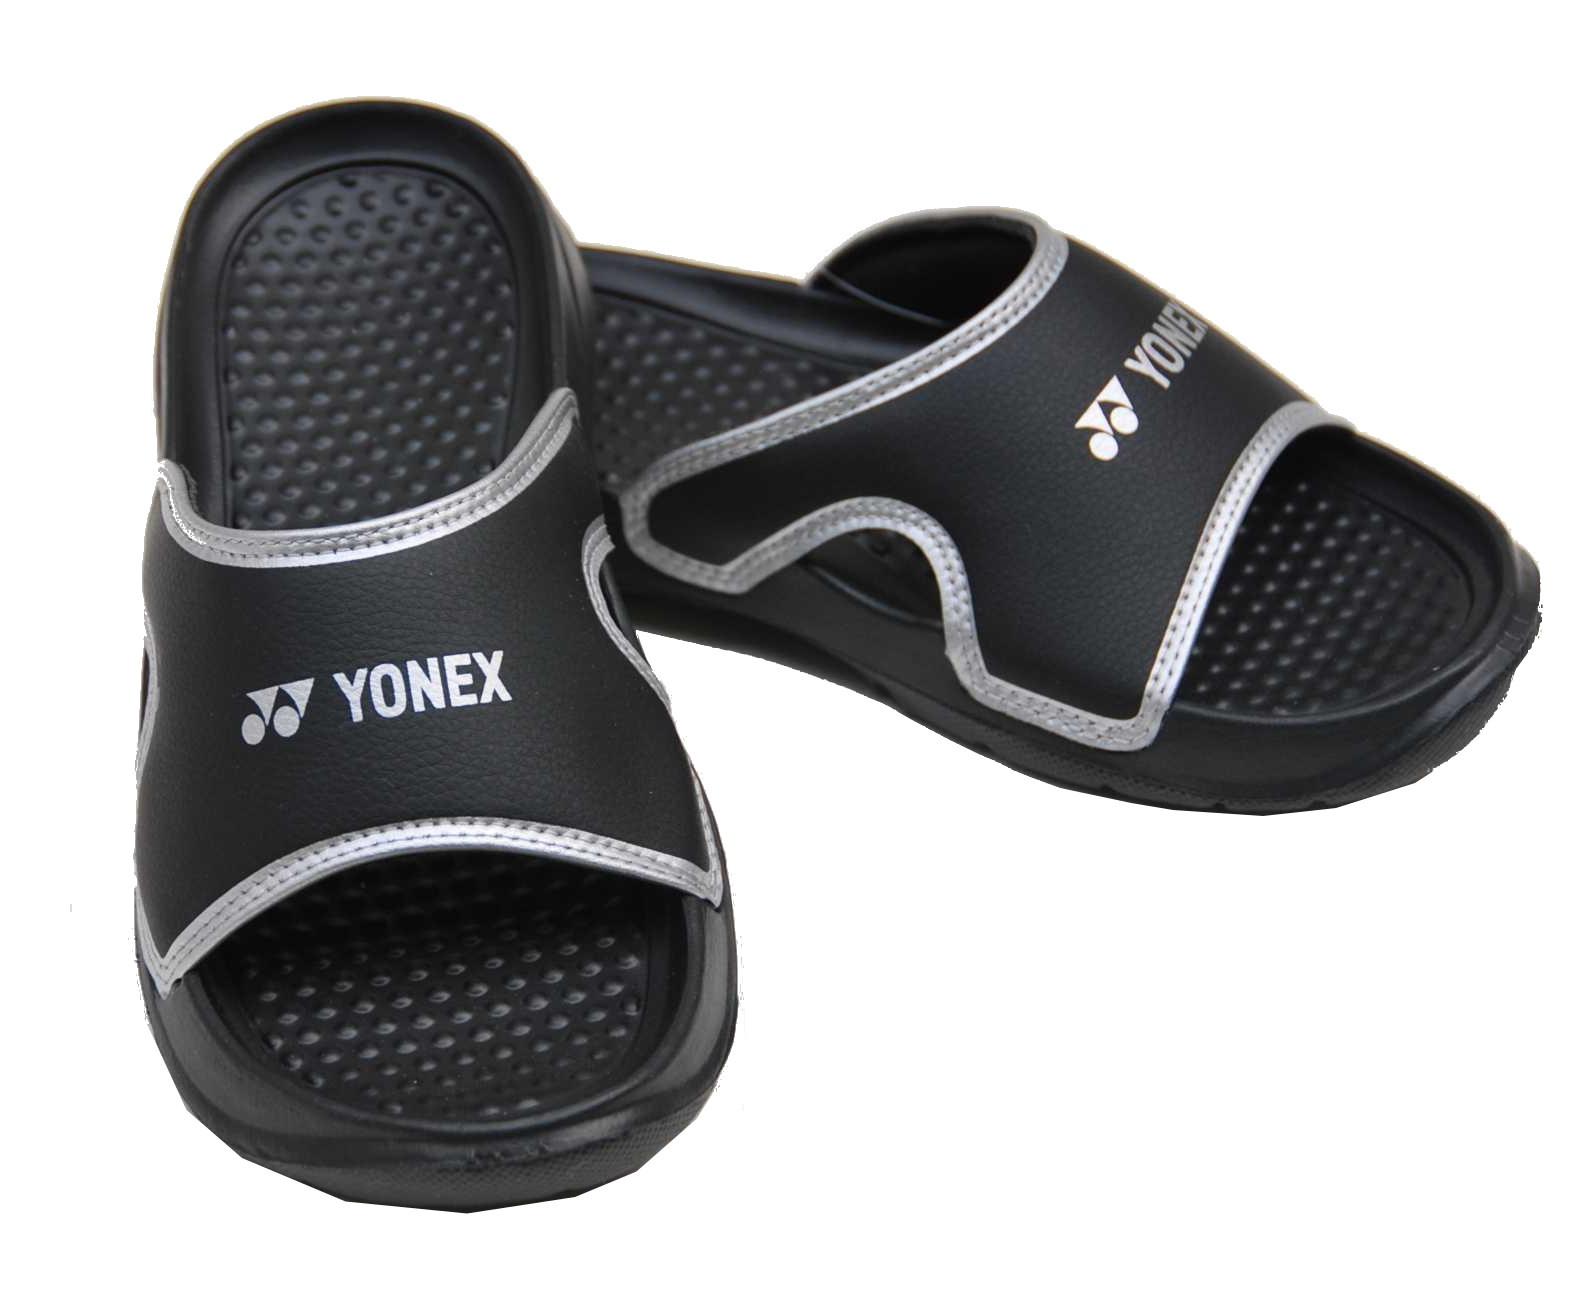 b83ceb829 Yonex (Tennis) slippers black - Internet-Sport Casuals